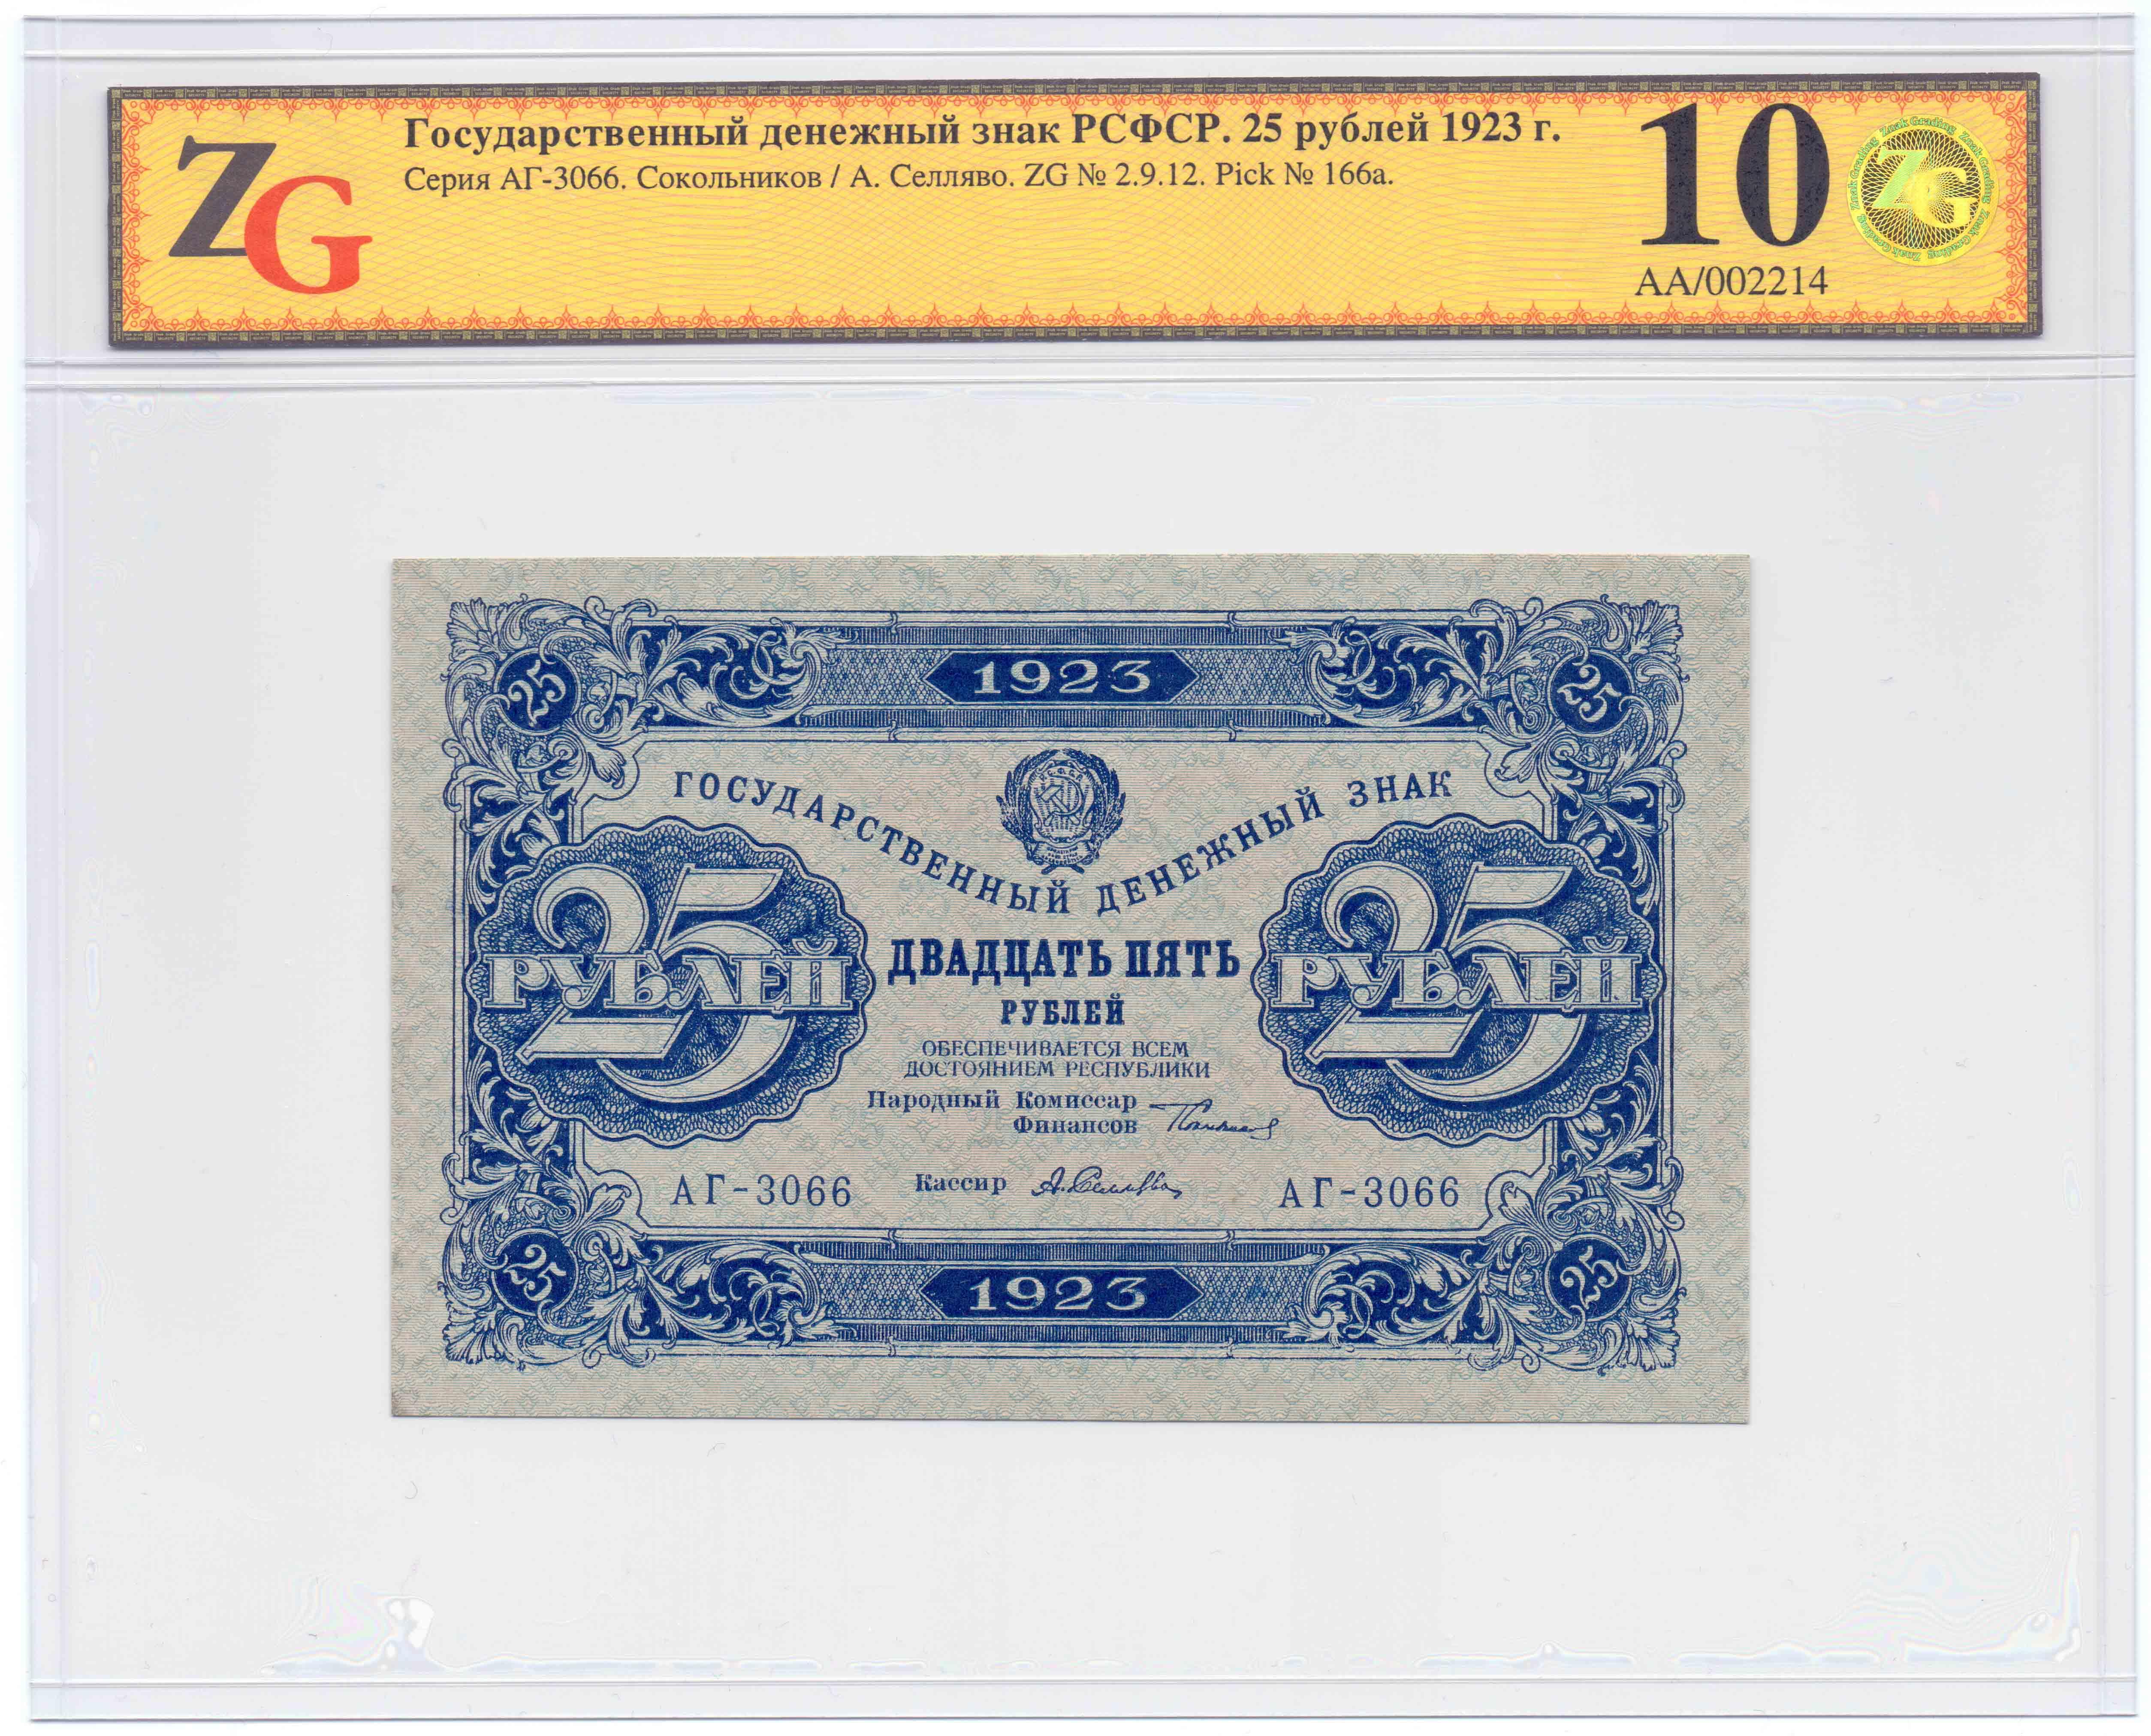 25 рублей  1923 г. АГ-3066 ZG № 2.9.12. 67 GUnc Pick.166a